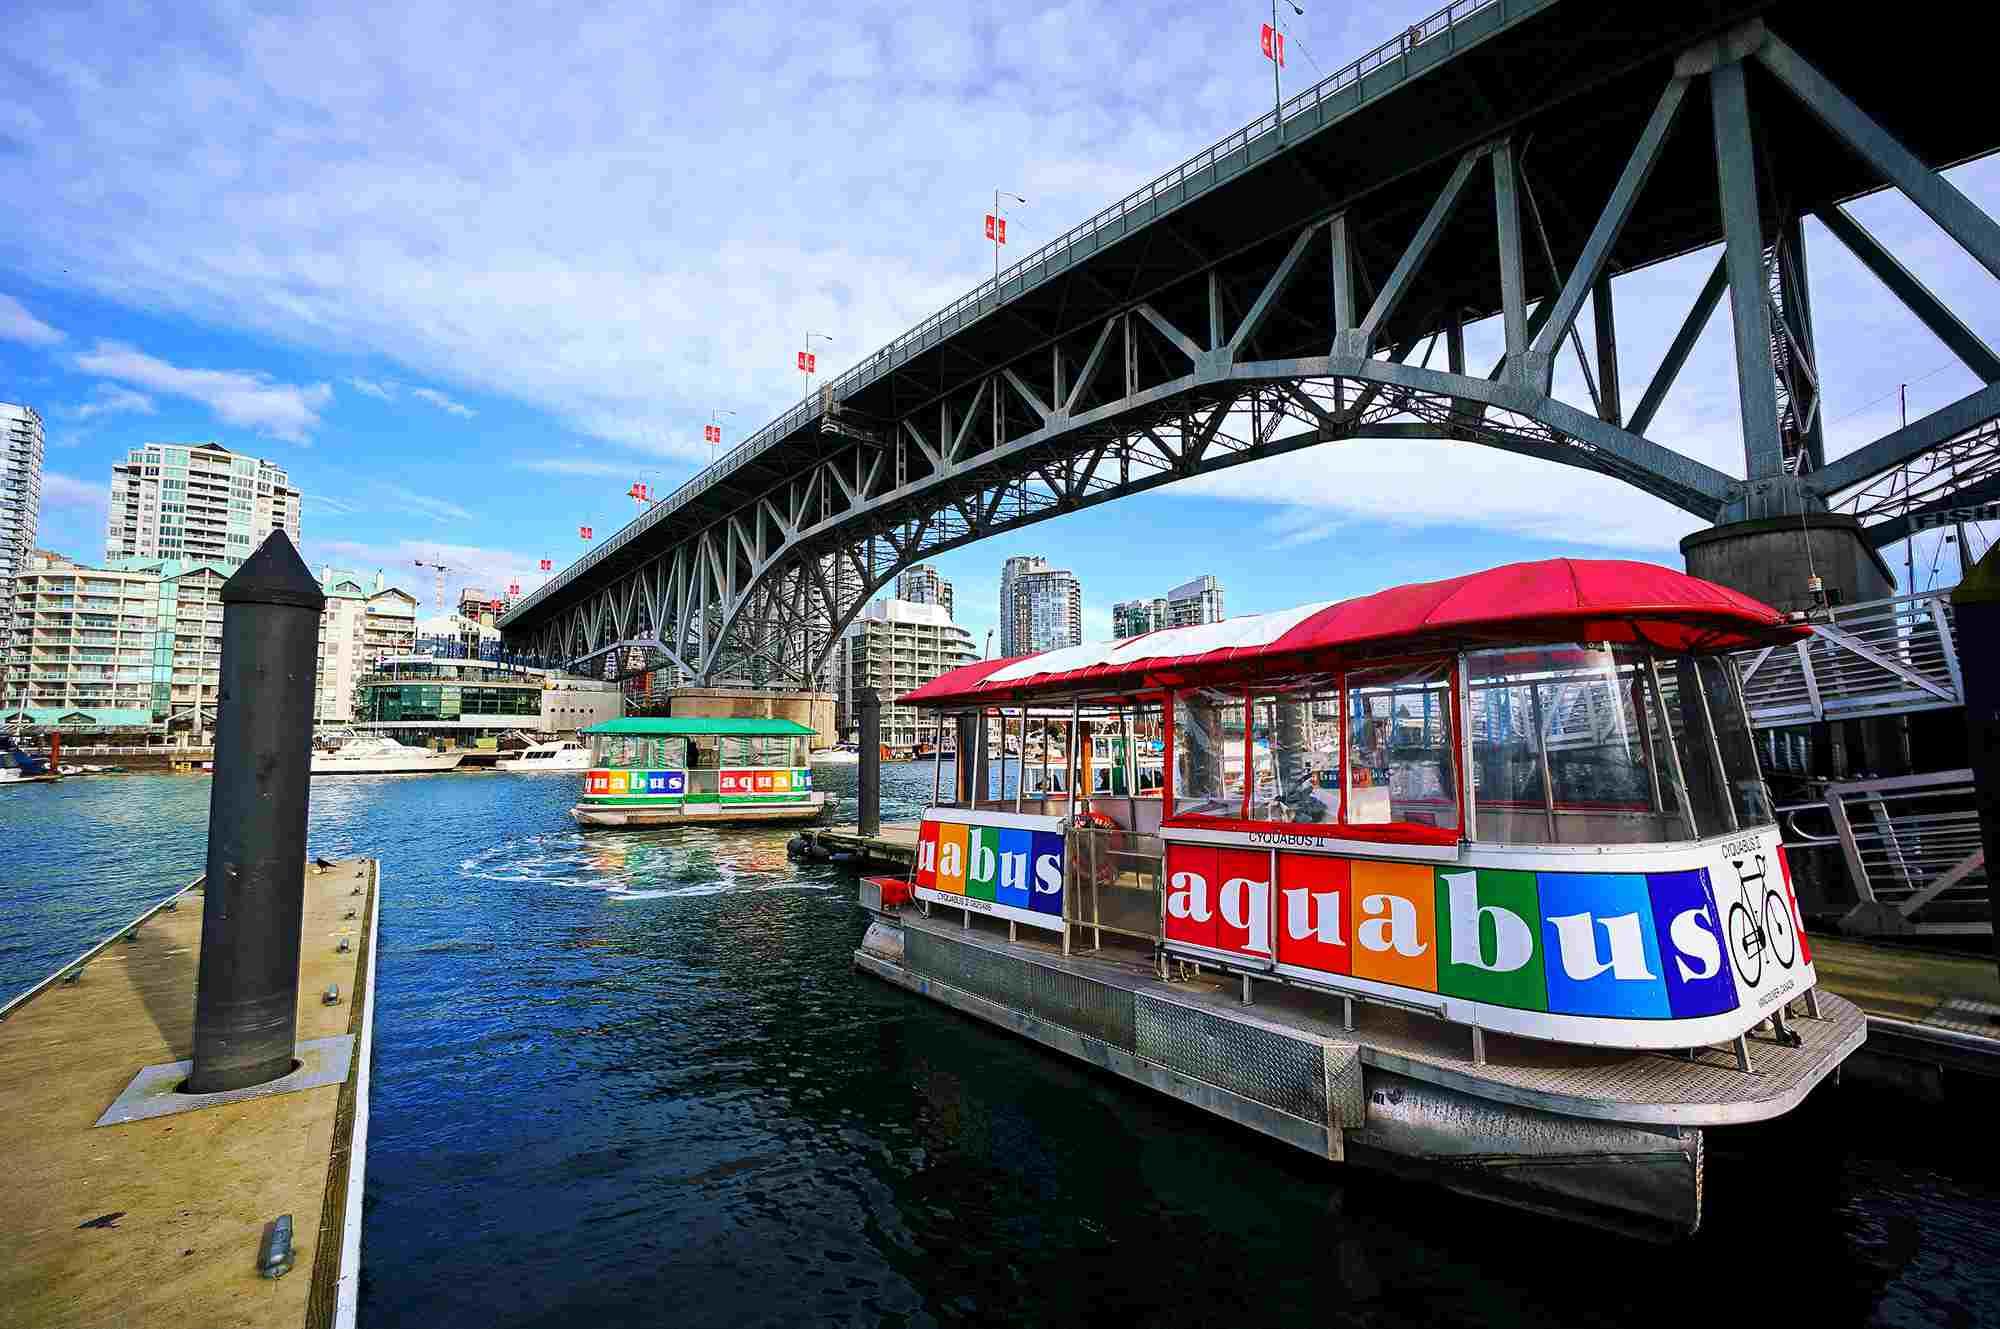 The Aquabus in Vancouver Canada